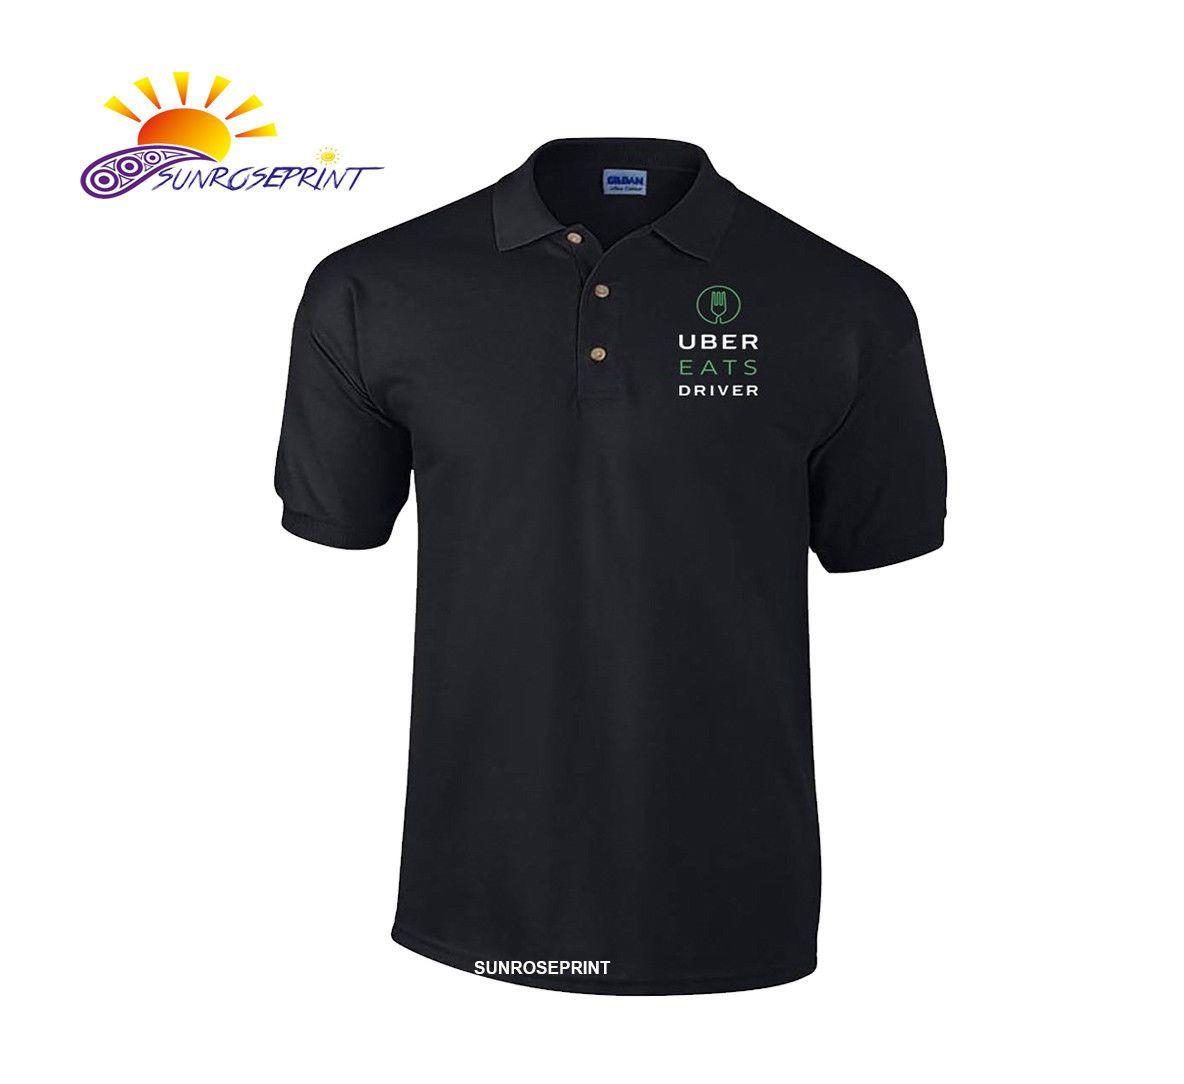 Details about UBER EATS Polo shirt, UBER EATS driver shirt